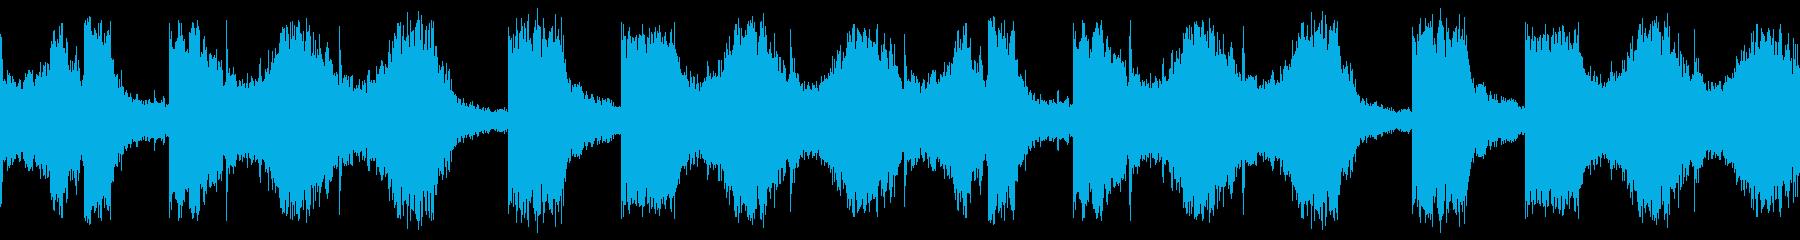 EDM リードシンセ 5 音楽制作用の再生済みの波形